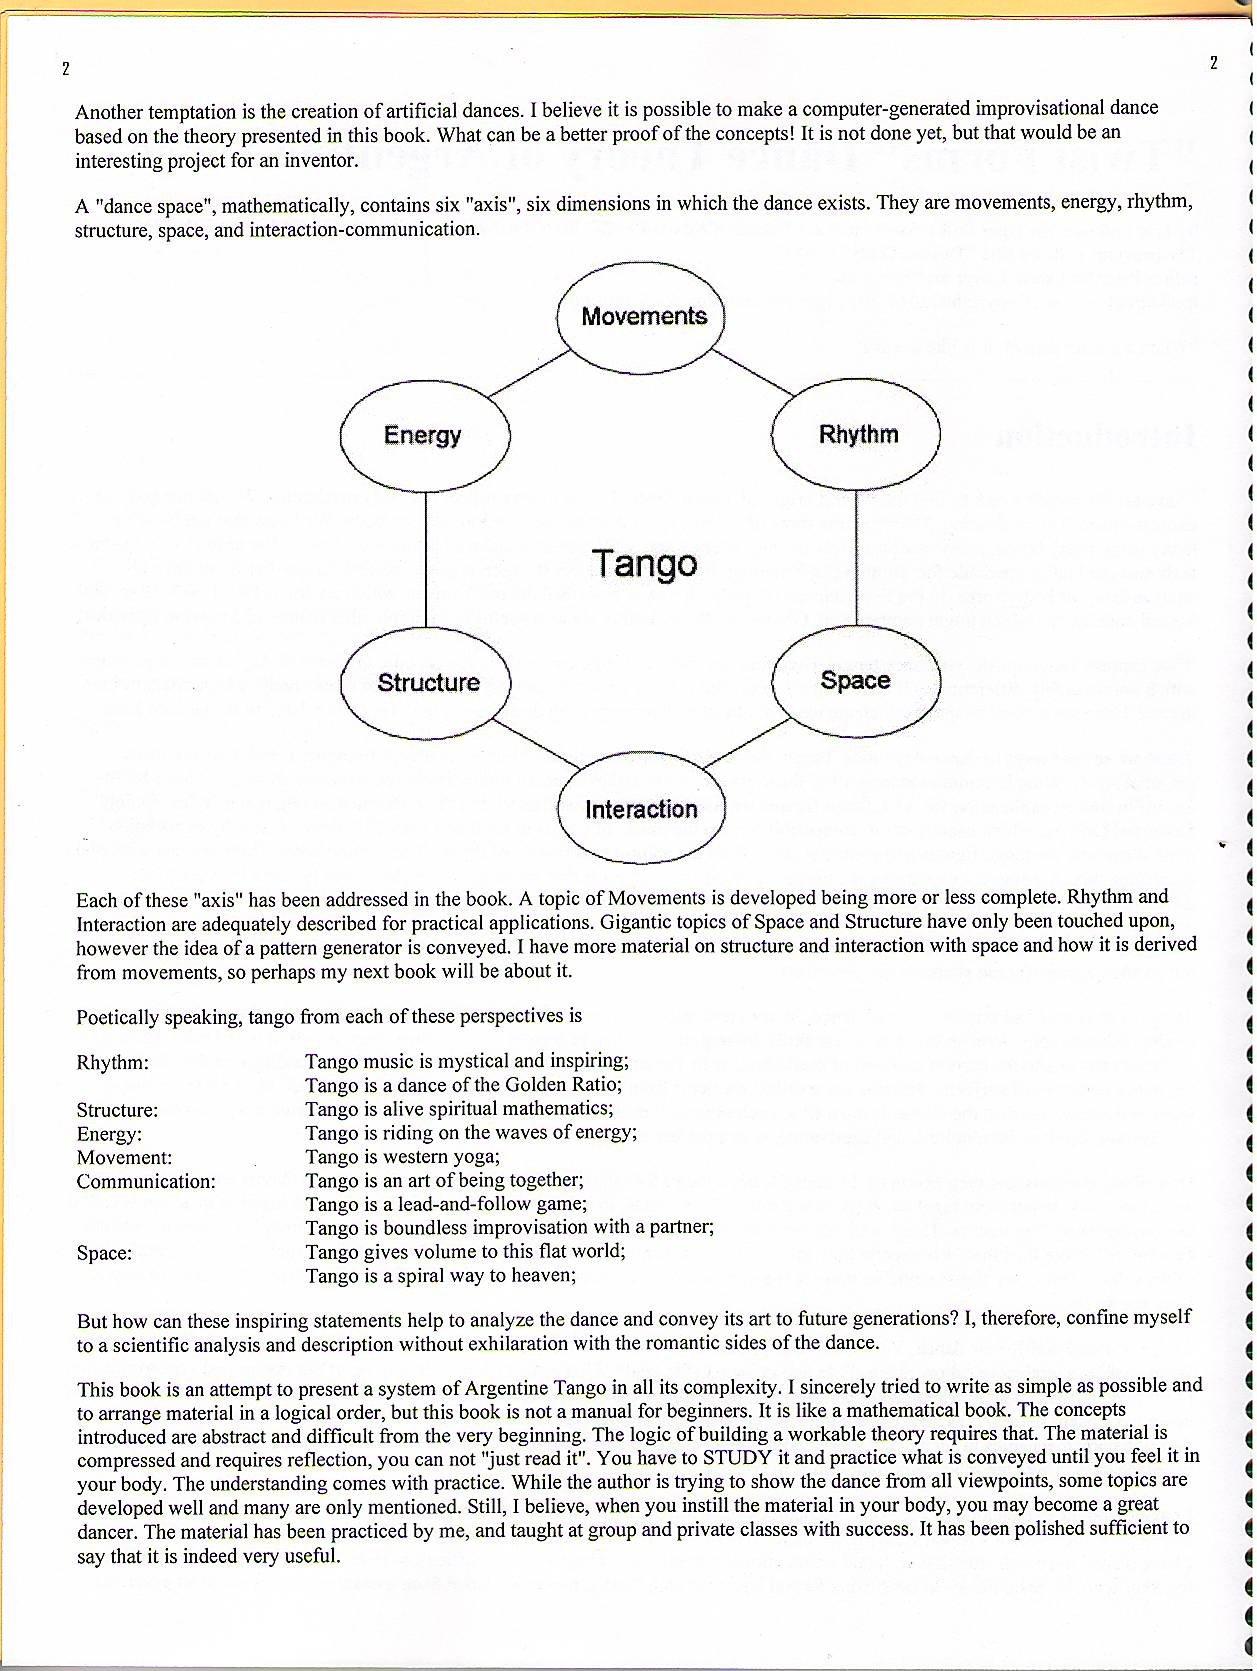 Twist Forms Dance Theory Of Argentine Tango Igor Polkovnikov Steps Diagram Figures Books